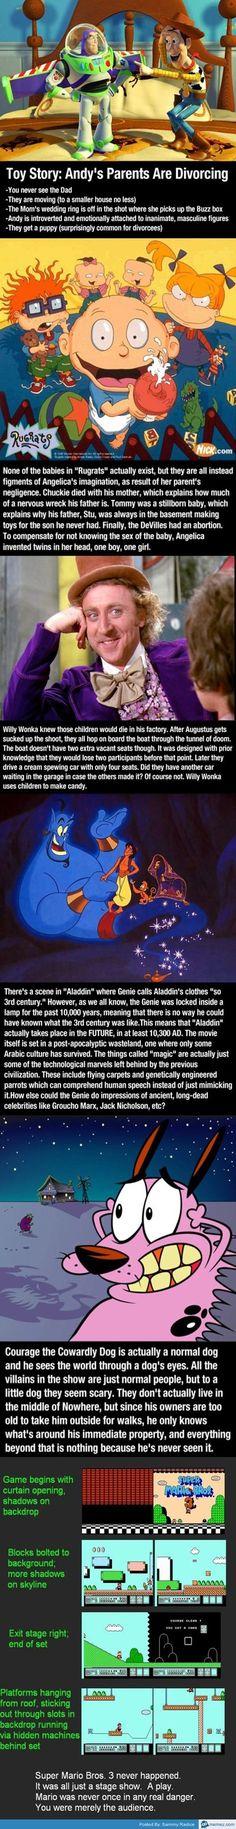 OMG the aladdin conspiracy theory!